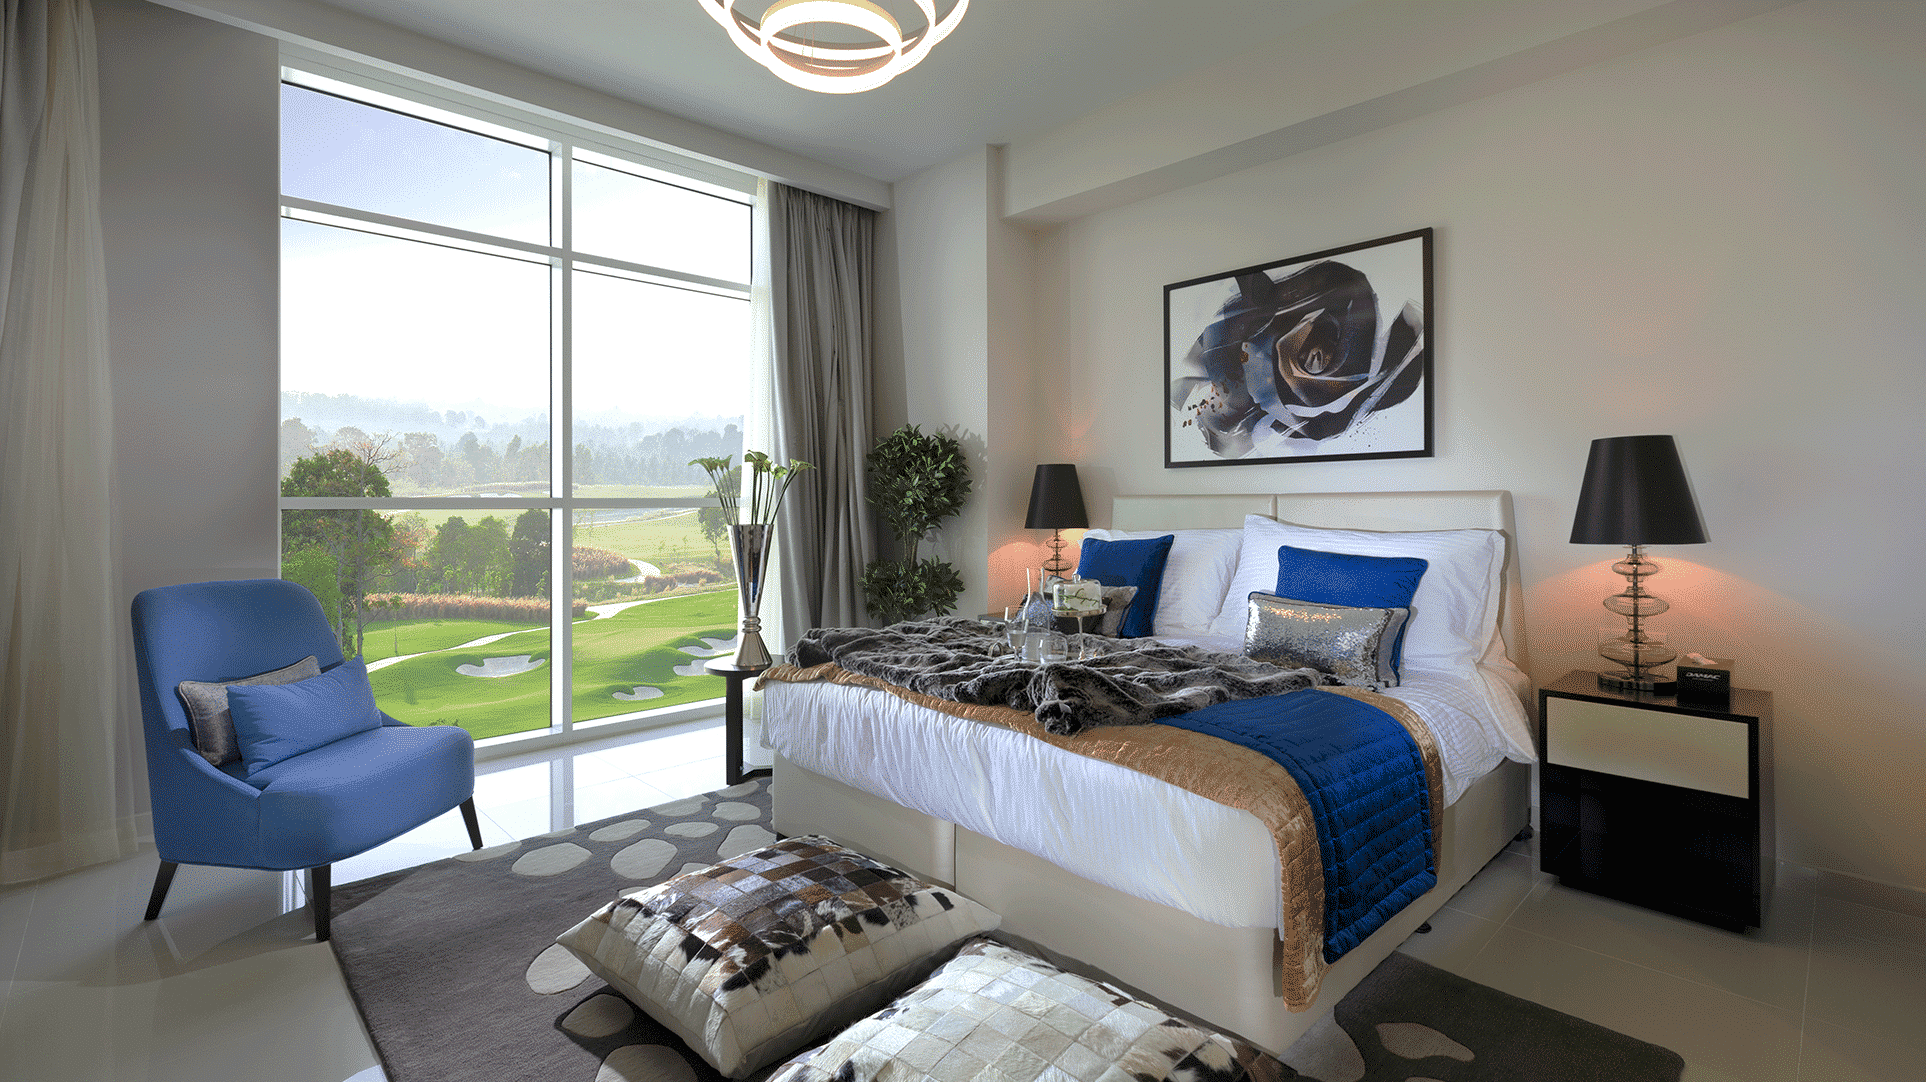 Radisson Hotel by Damac at Damac Hills. Luxury apartments for Sale in Dubai 1